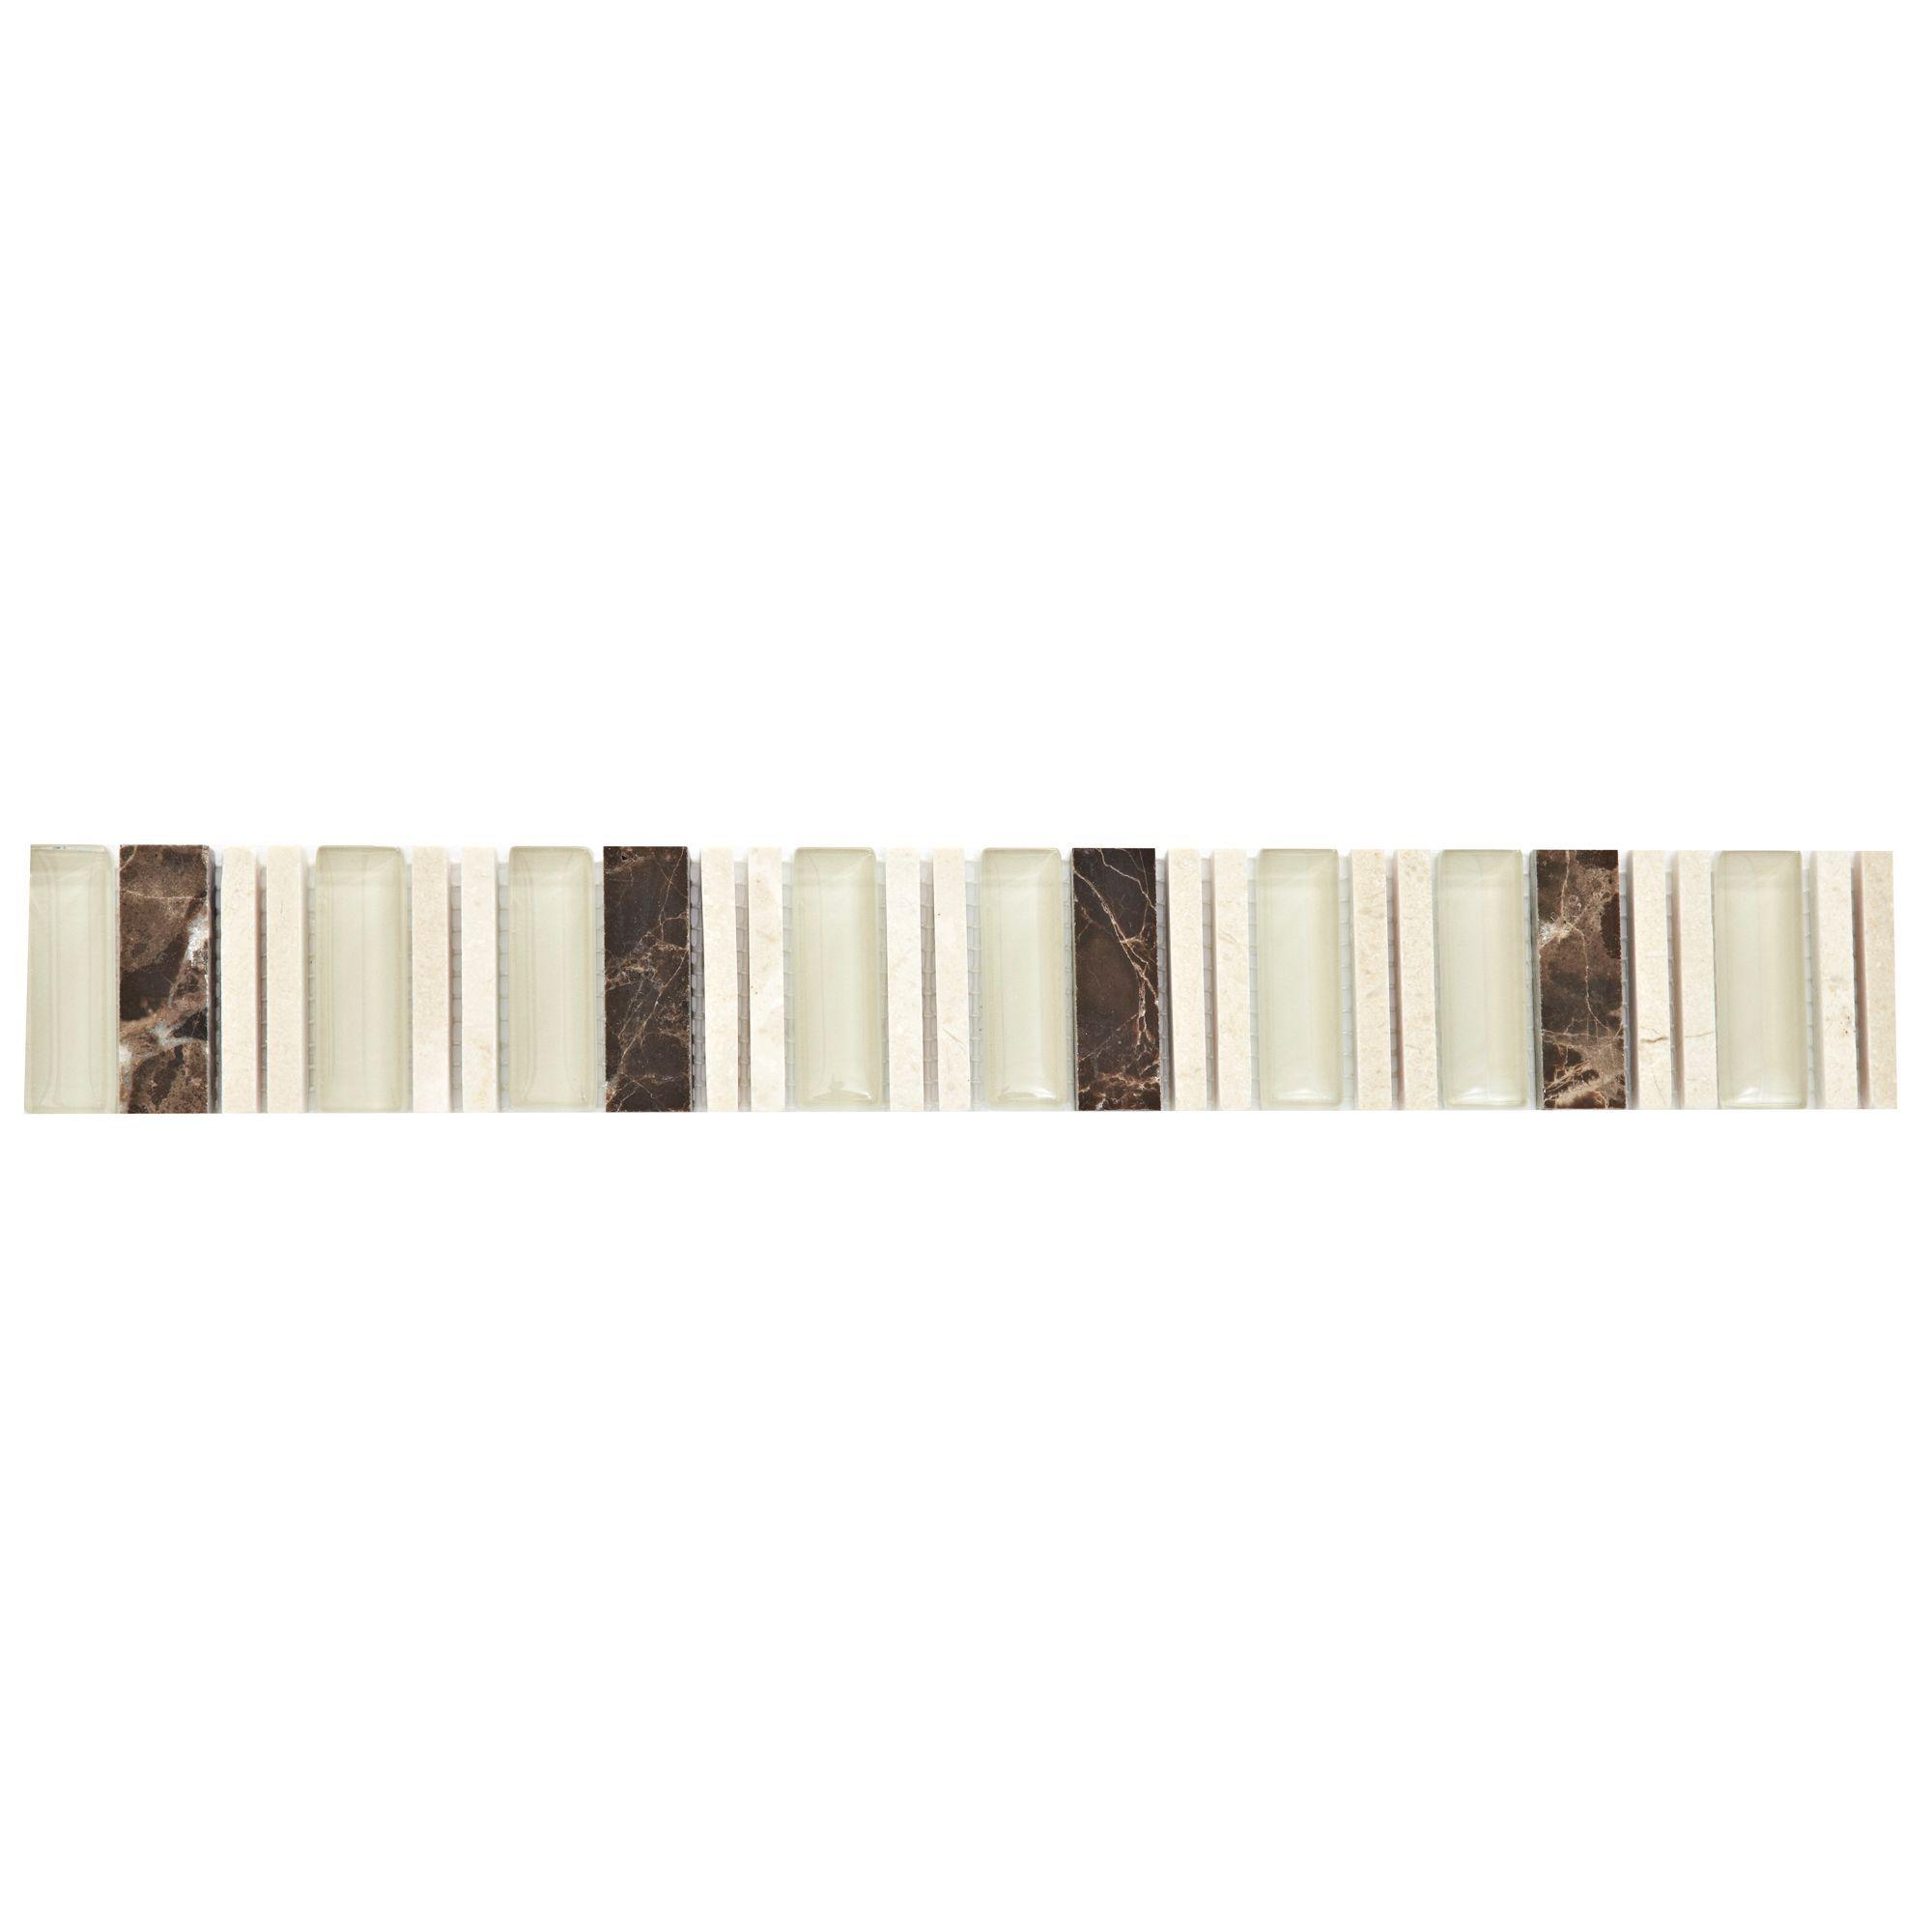 Matchstick Natural Mosaic Border Tile, (l)330mm (w)48mm